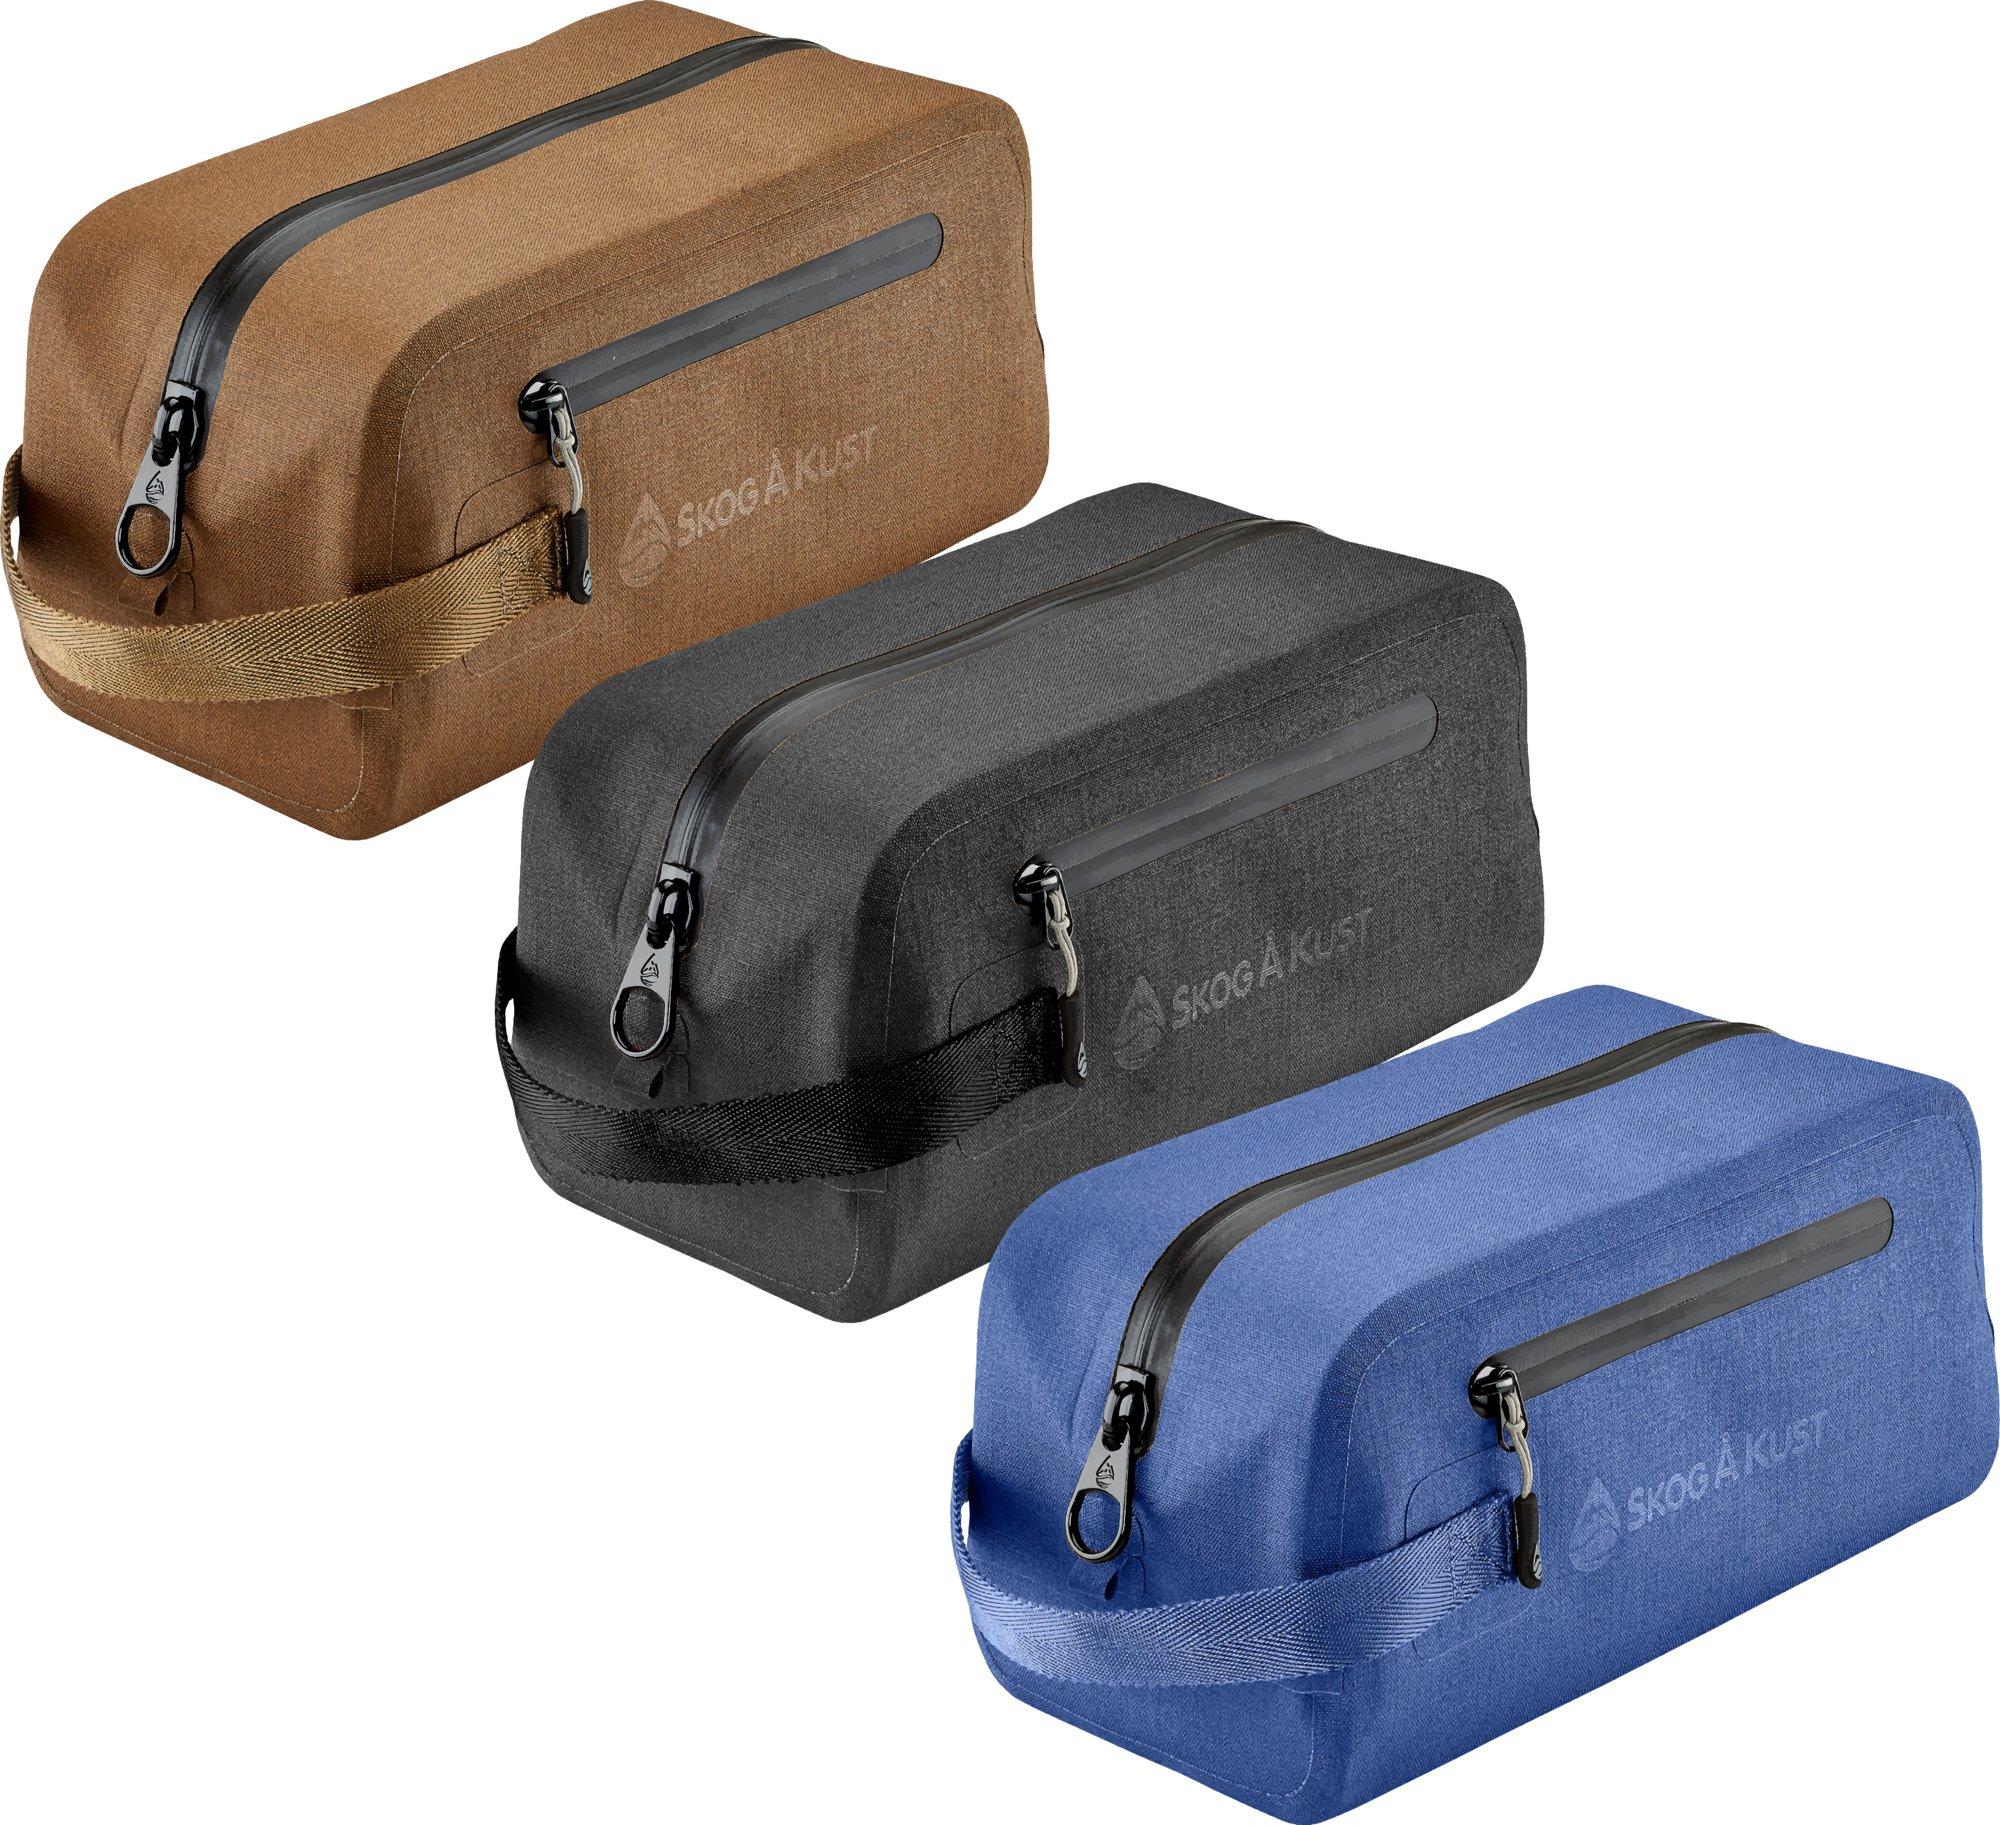 DoppSåk Waterproof & Leak-proof Travel Toiletry Bag | Blue